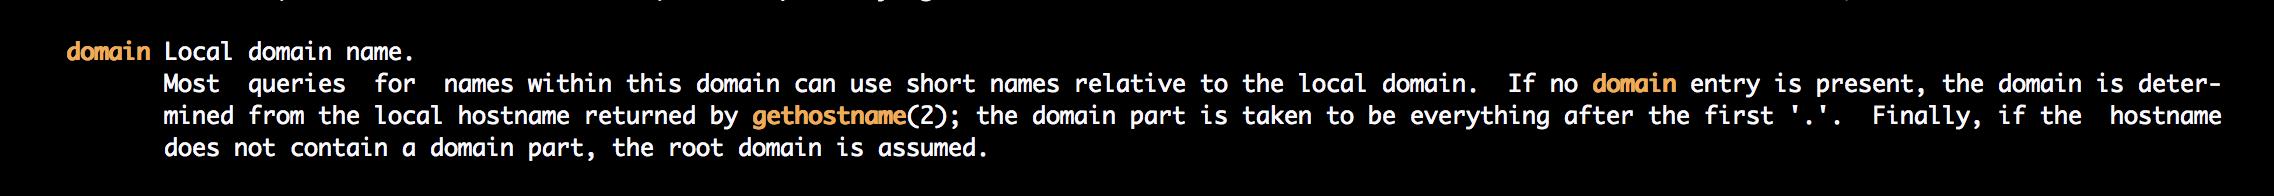 Dns Fqdn Cannot Ping Hostnames But Can Ping Hostnames Fqdn